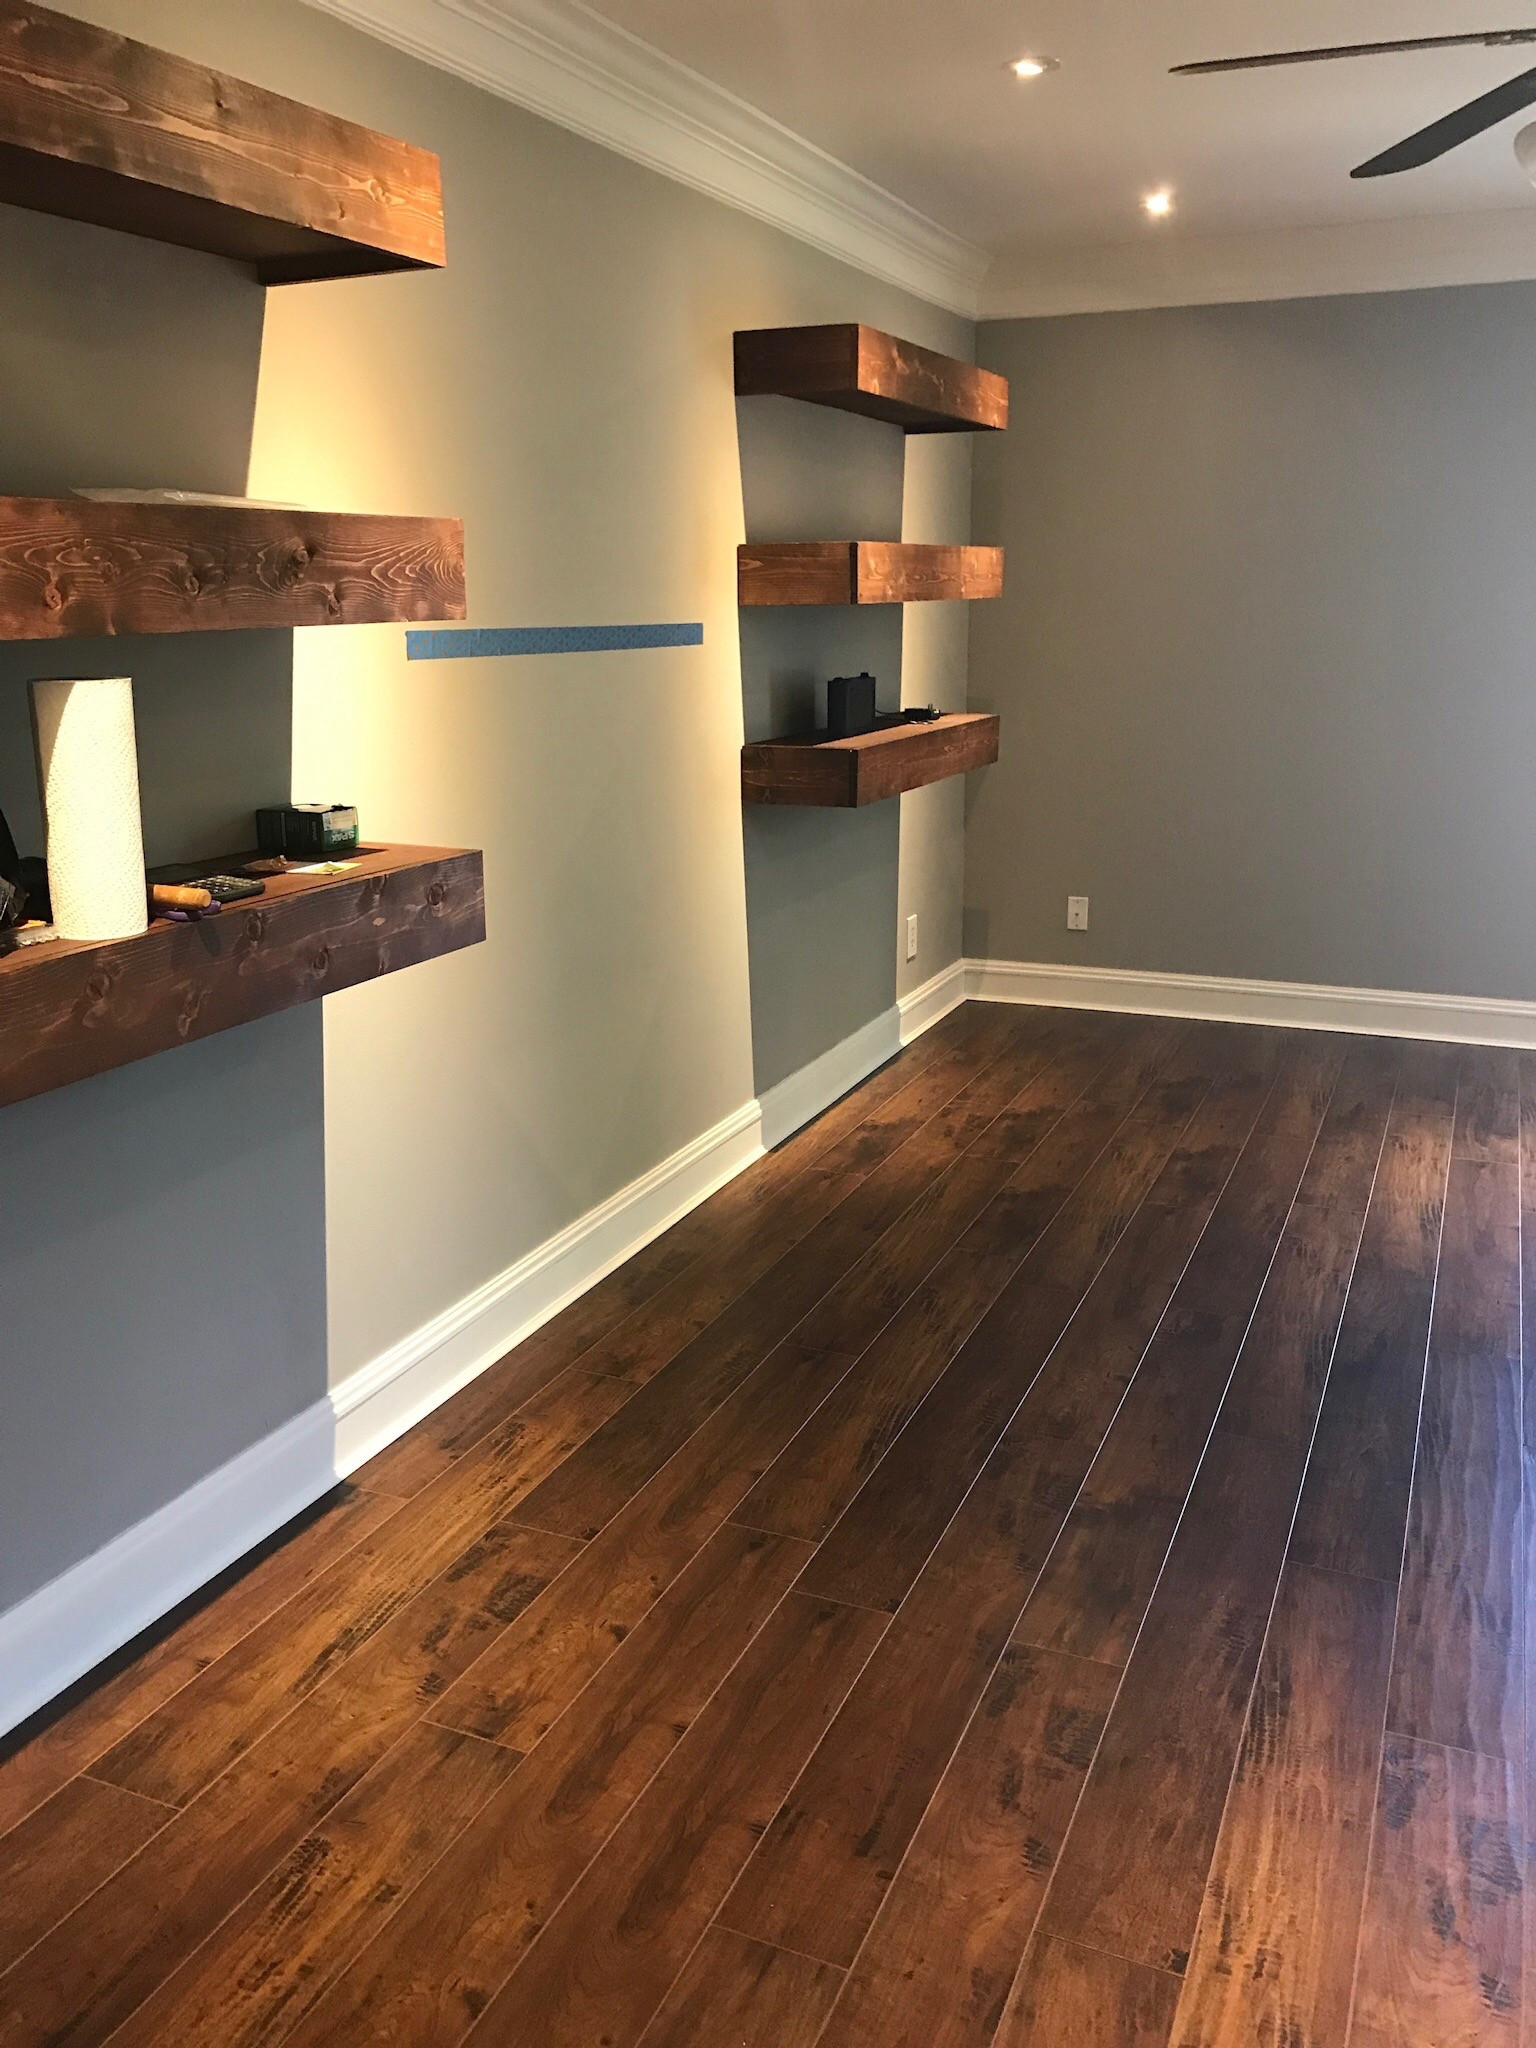 Best ideas about DIY Laminate Floor Installation . Save or Pin Installing Laminate Flooring DIY Bonus Room Makeover Now.